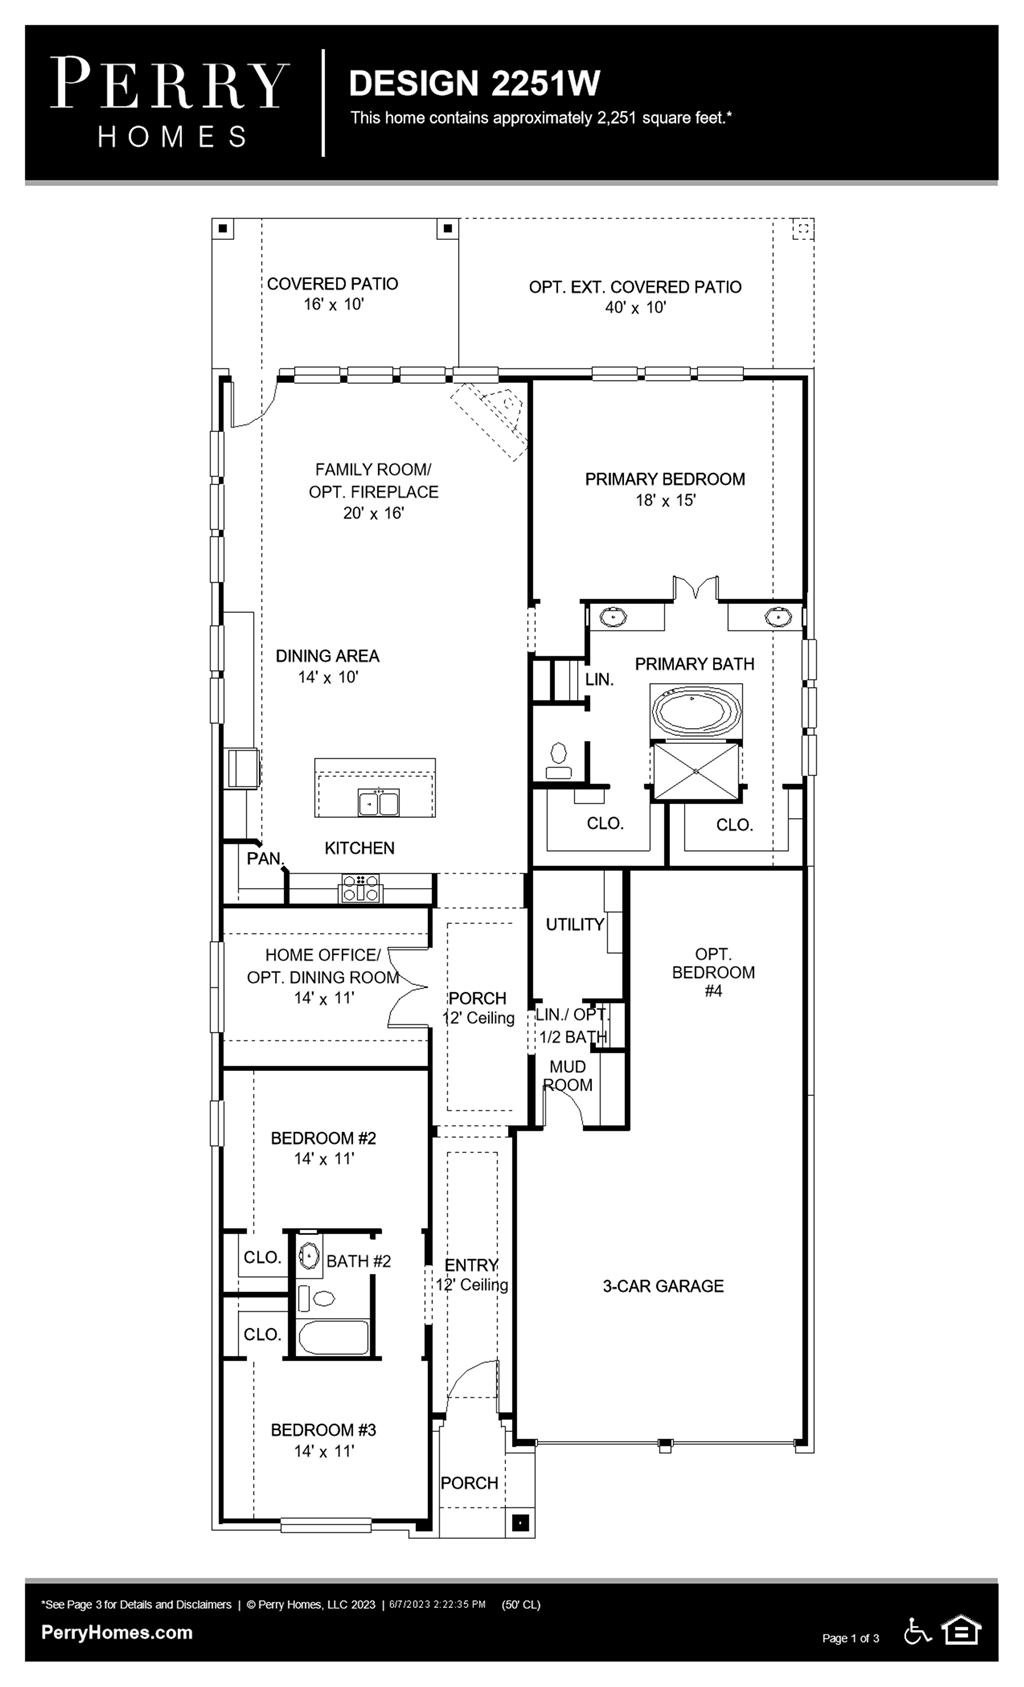 Floor Plan for 2251W